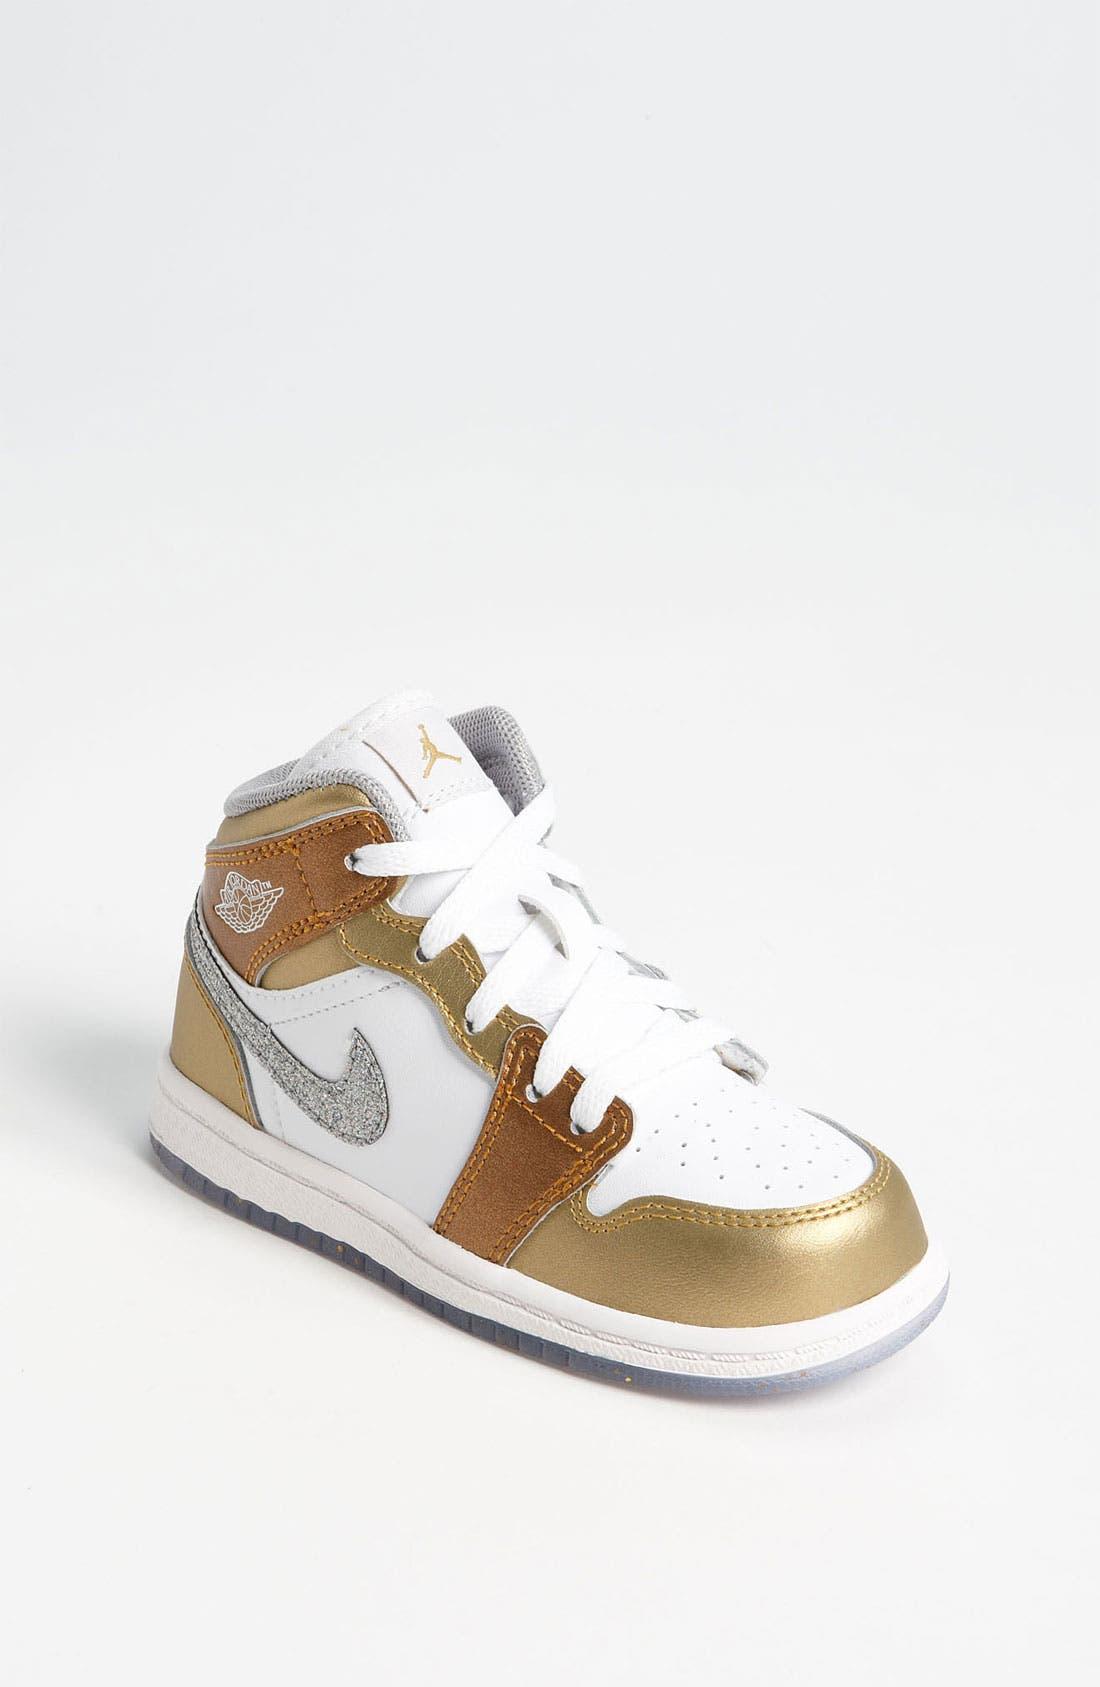 Alternate Image 1 Selected - Nike 'Jordan 1 Phat' Sneaker (Baby, Walker & Toddler)